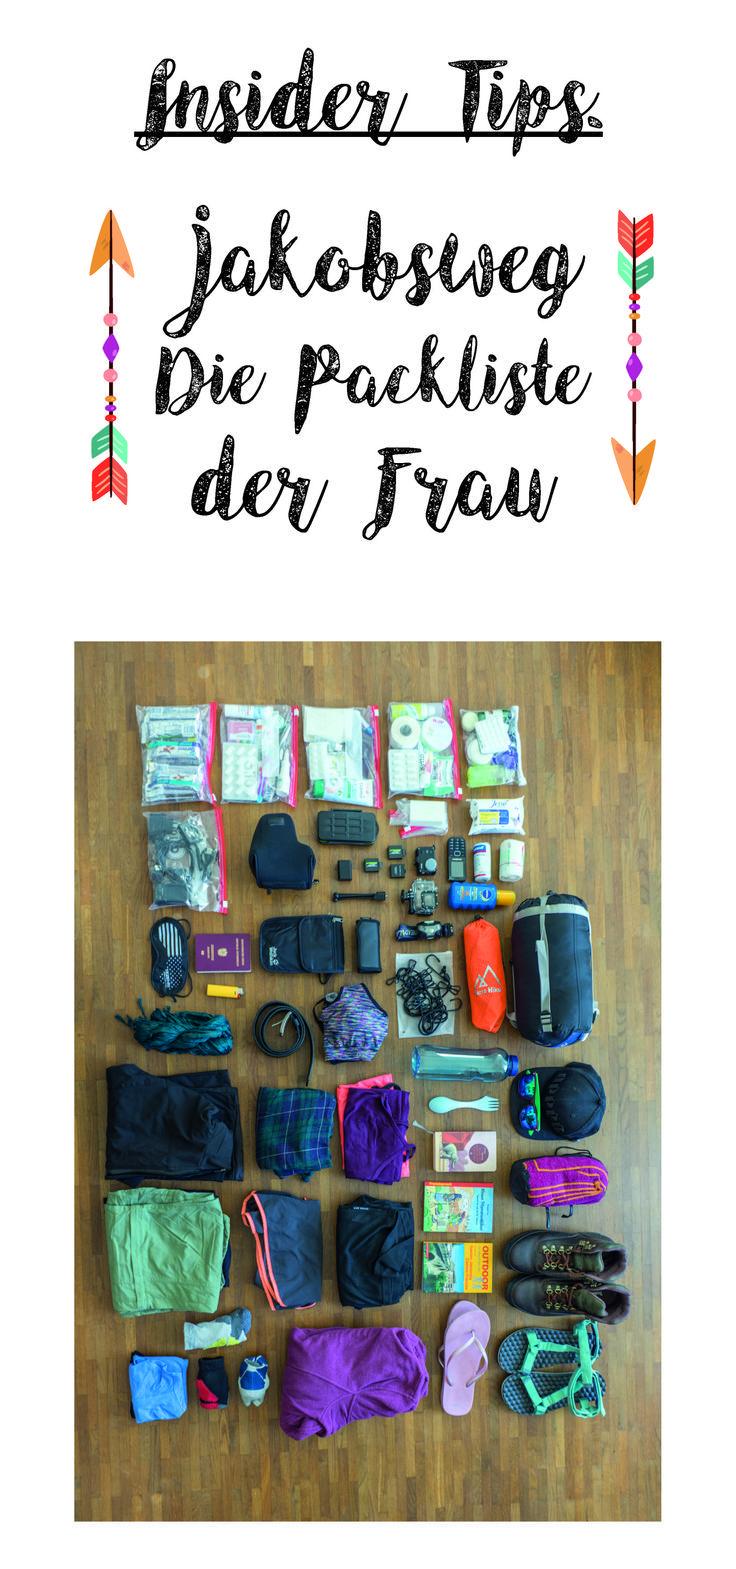 Photo of Camino de Frances – hiking boots & mascara: the packing list – boots & mascara: the packlist